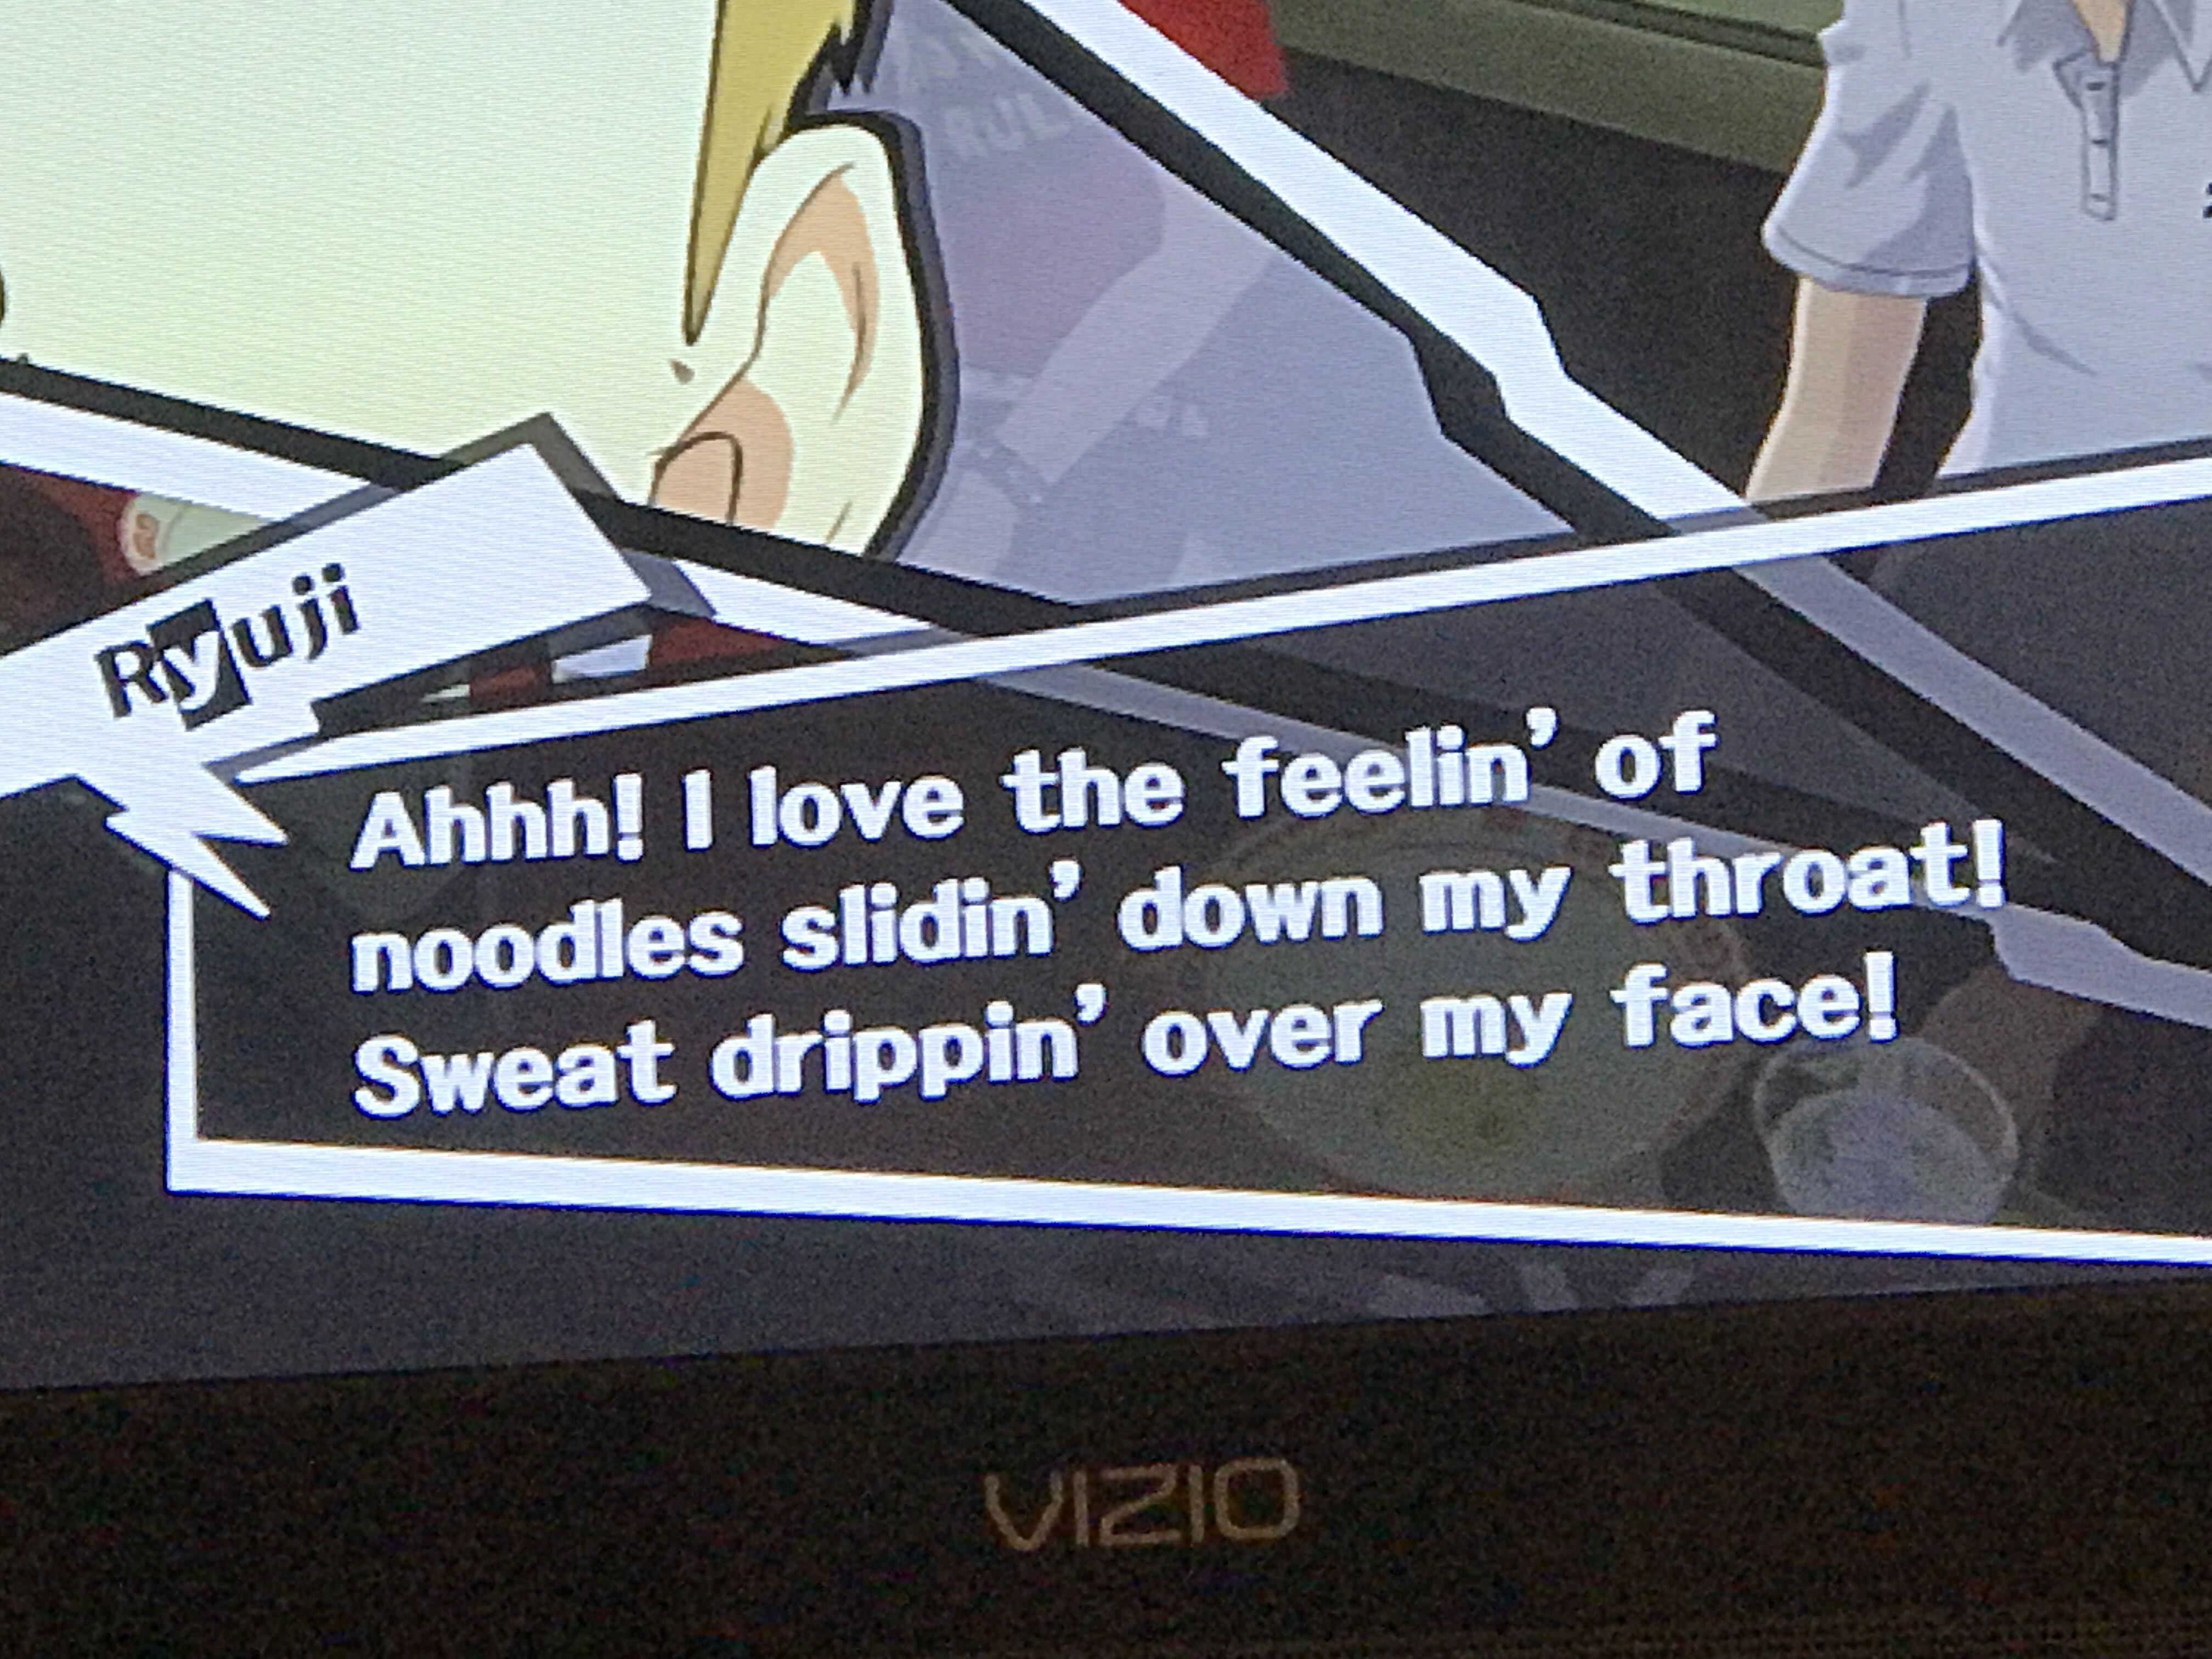 Whoa calm down Ryuji.